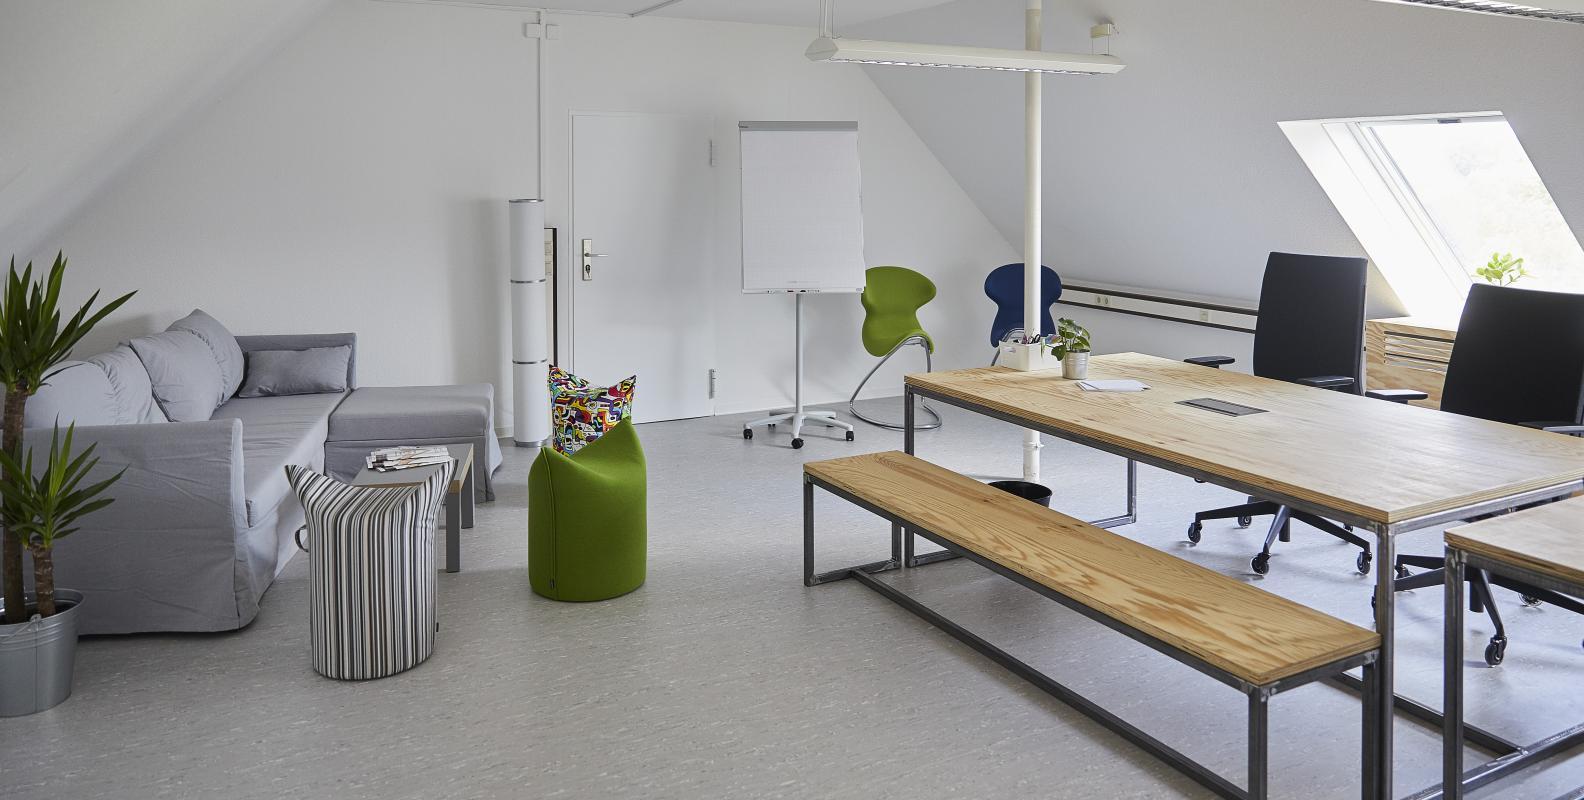 Co-office